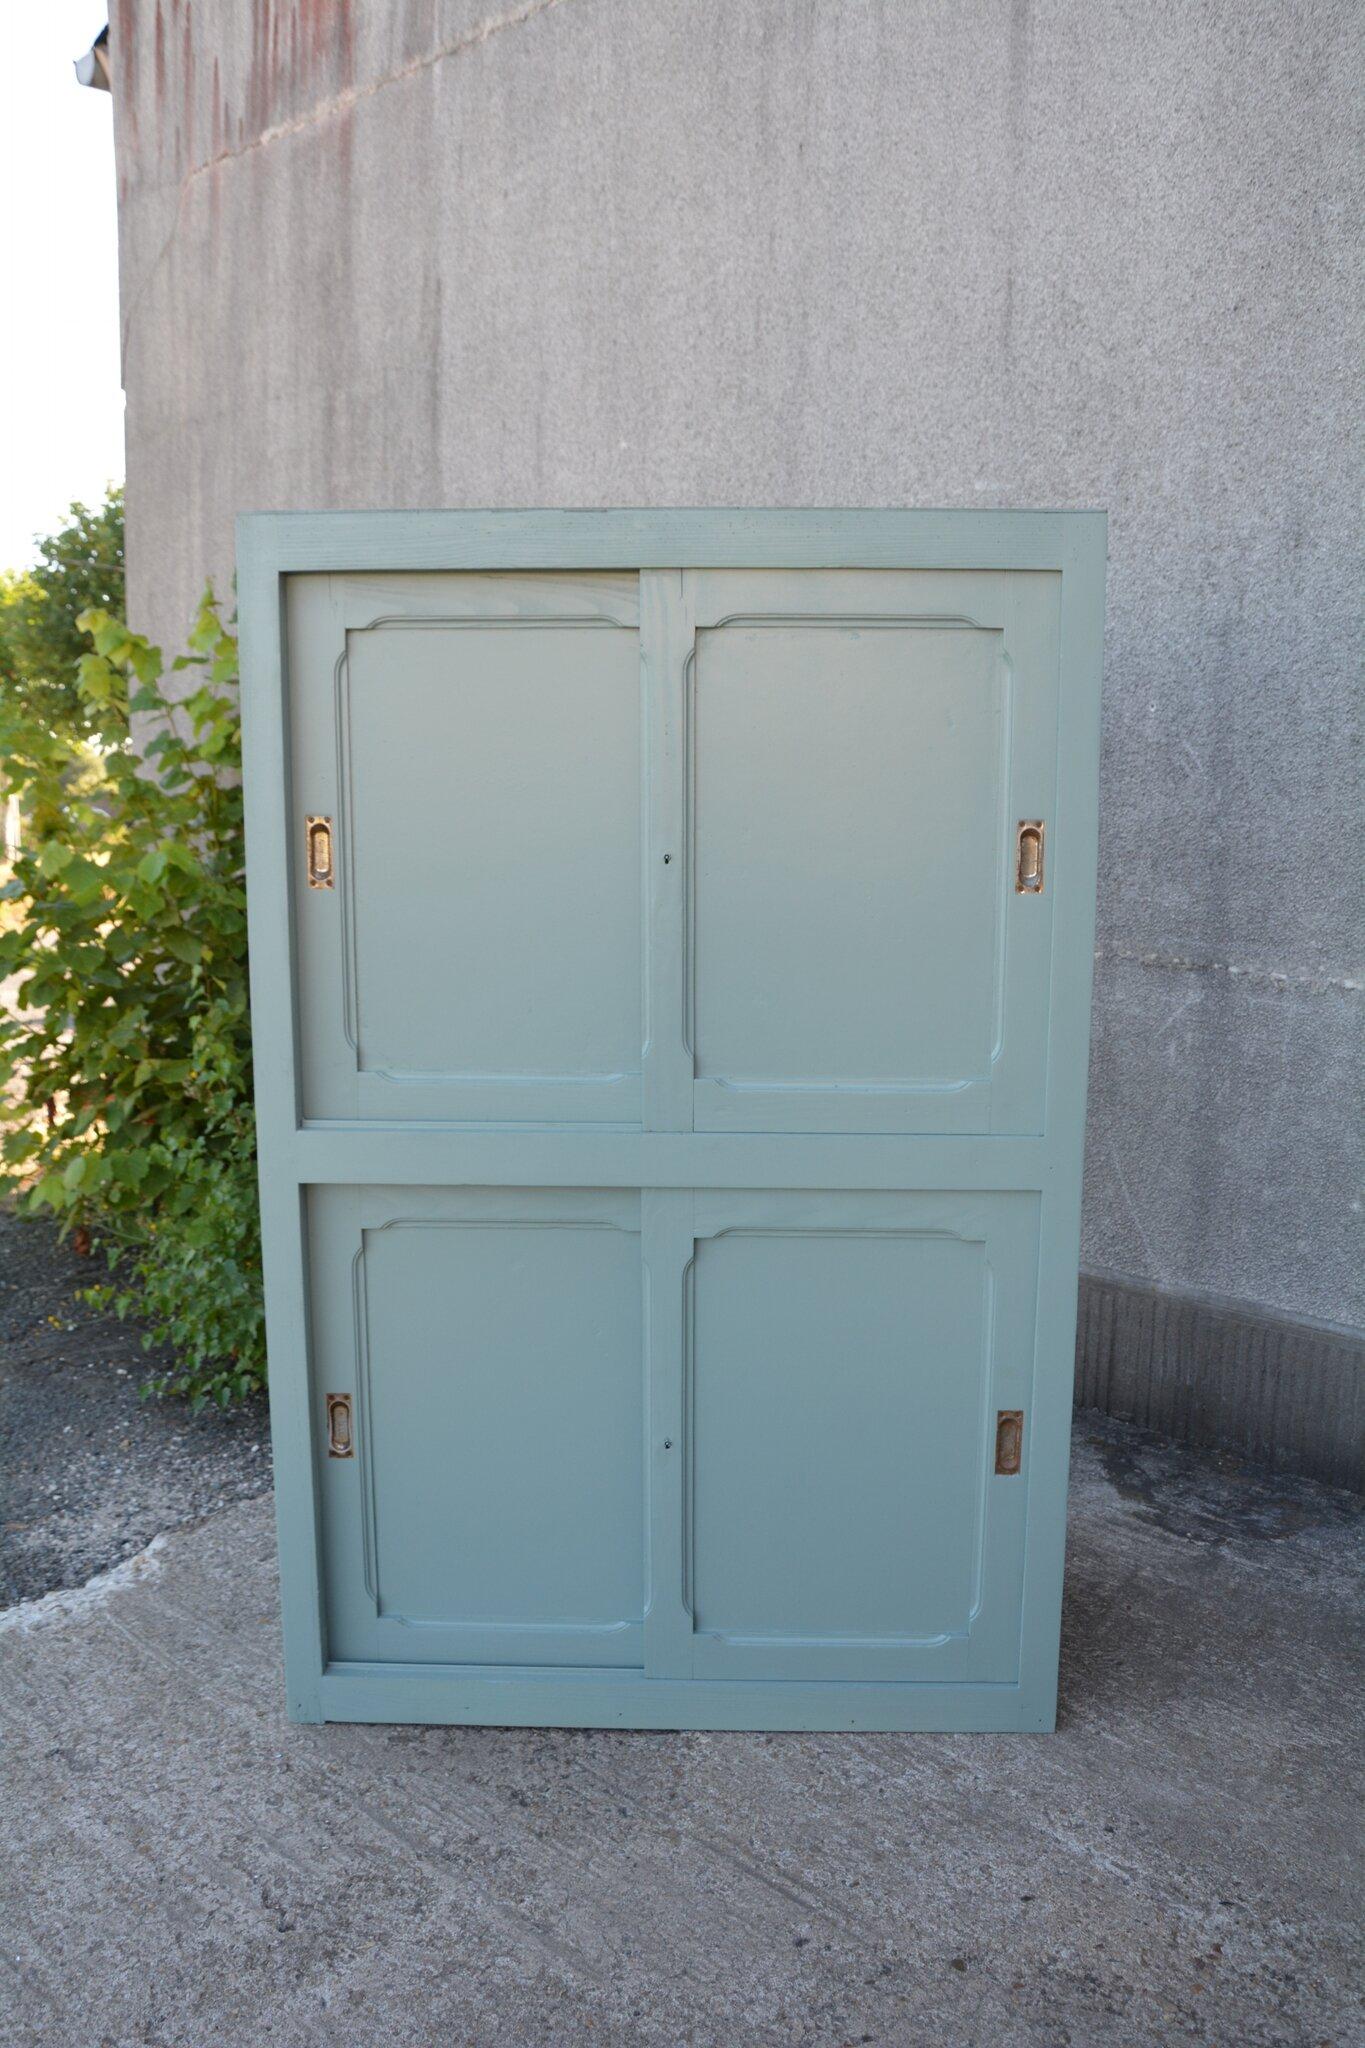 petite porte coulissante petite armoire armoire porte coulissante petite profondeur armoire. Black Bedroom Furniture Sets. Home Design Ideas